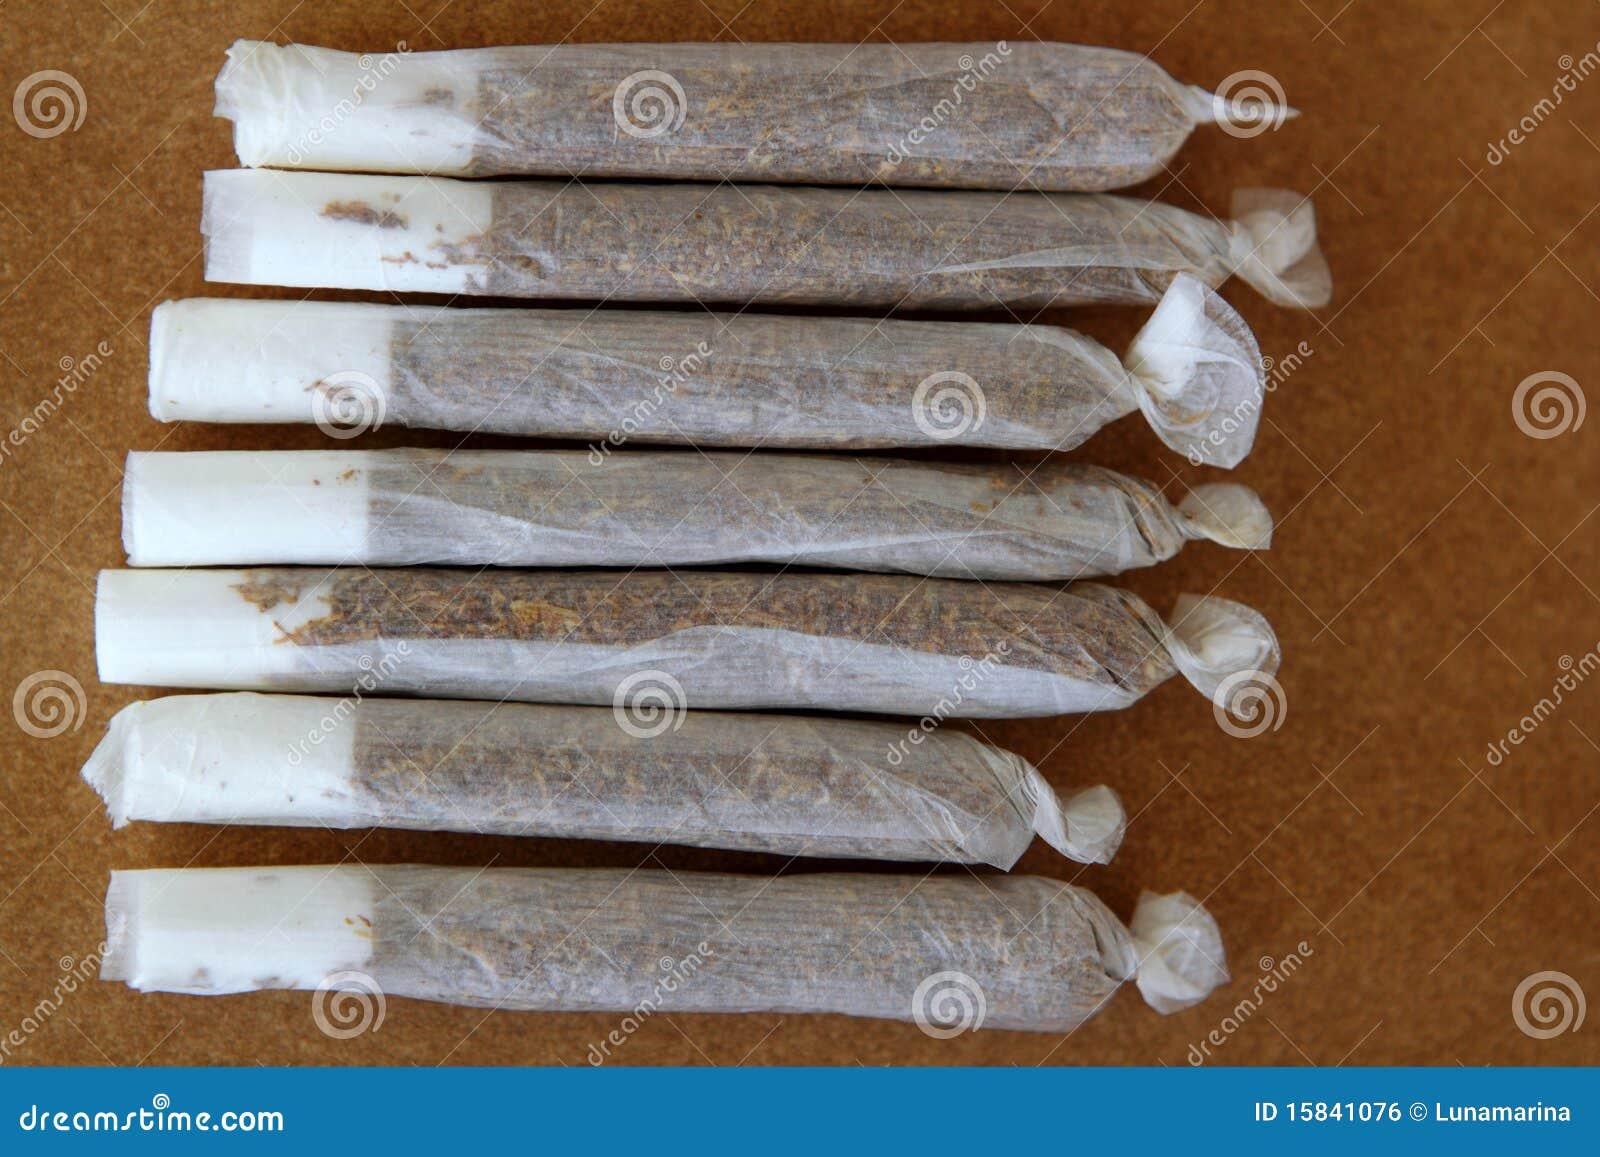 Бумага из трав своими руками